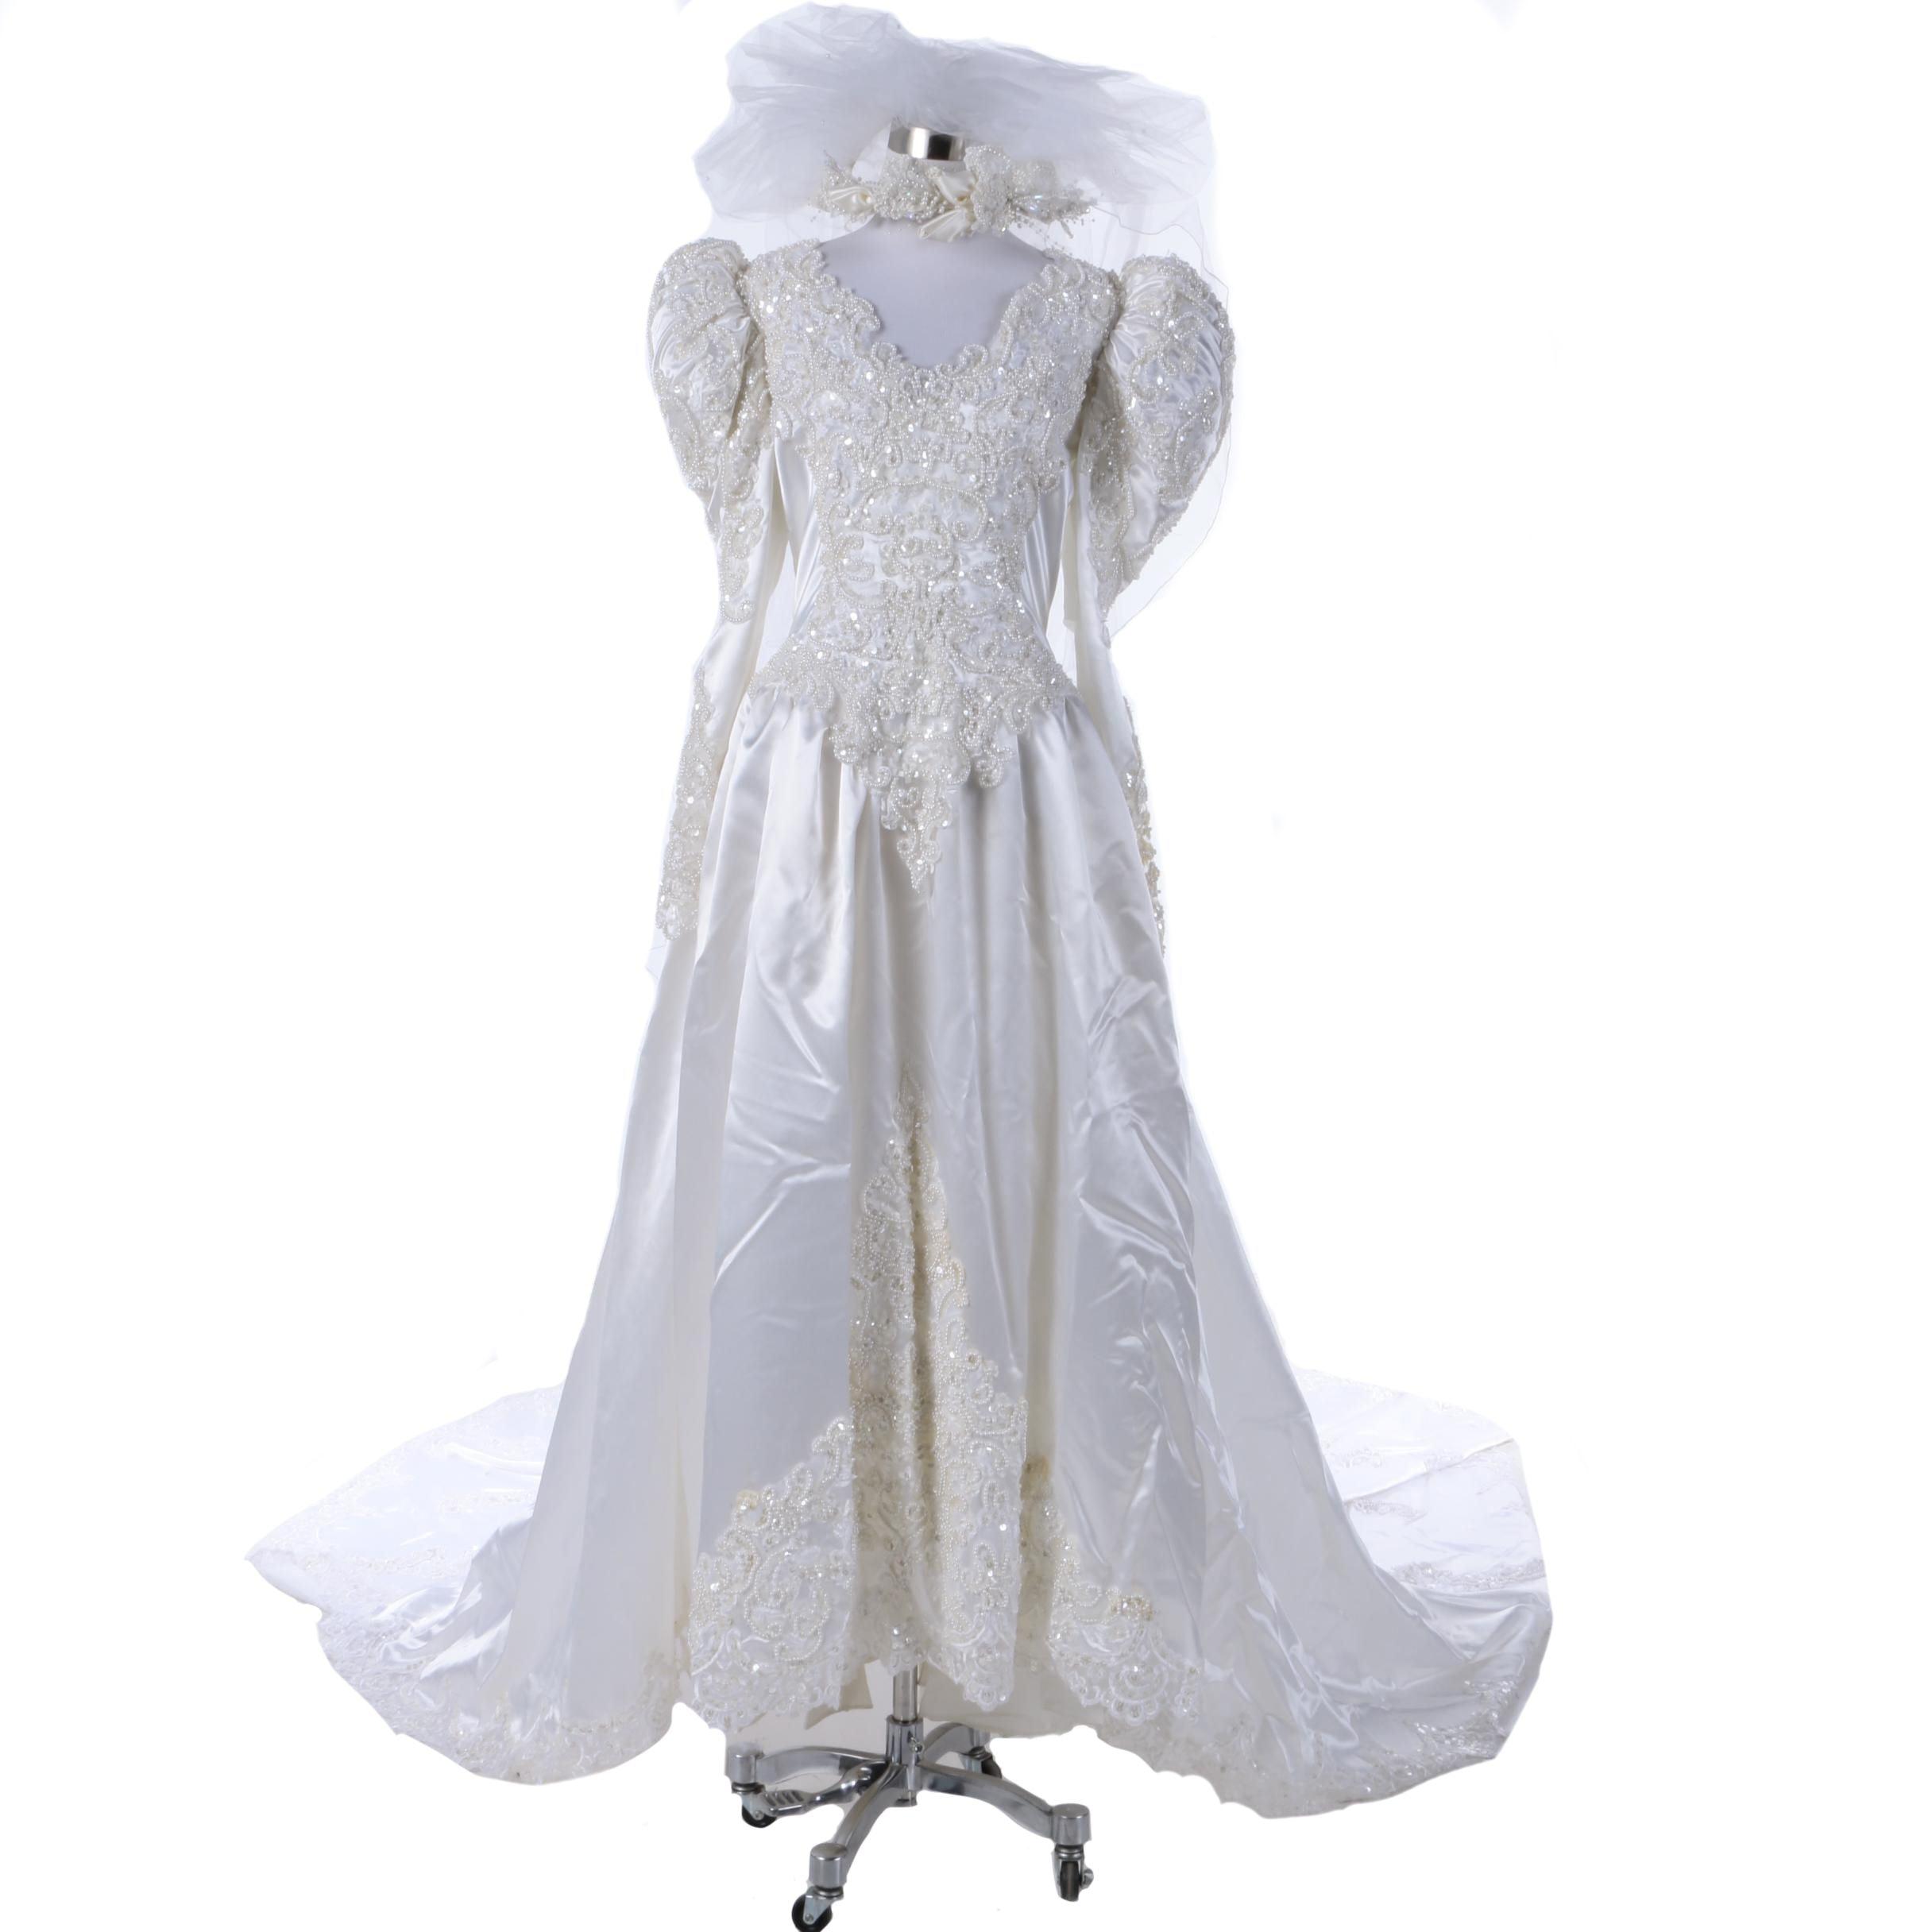 Circa 1980s Demitrios Wedding Gown and Veil